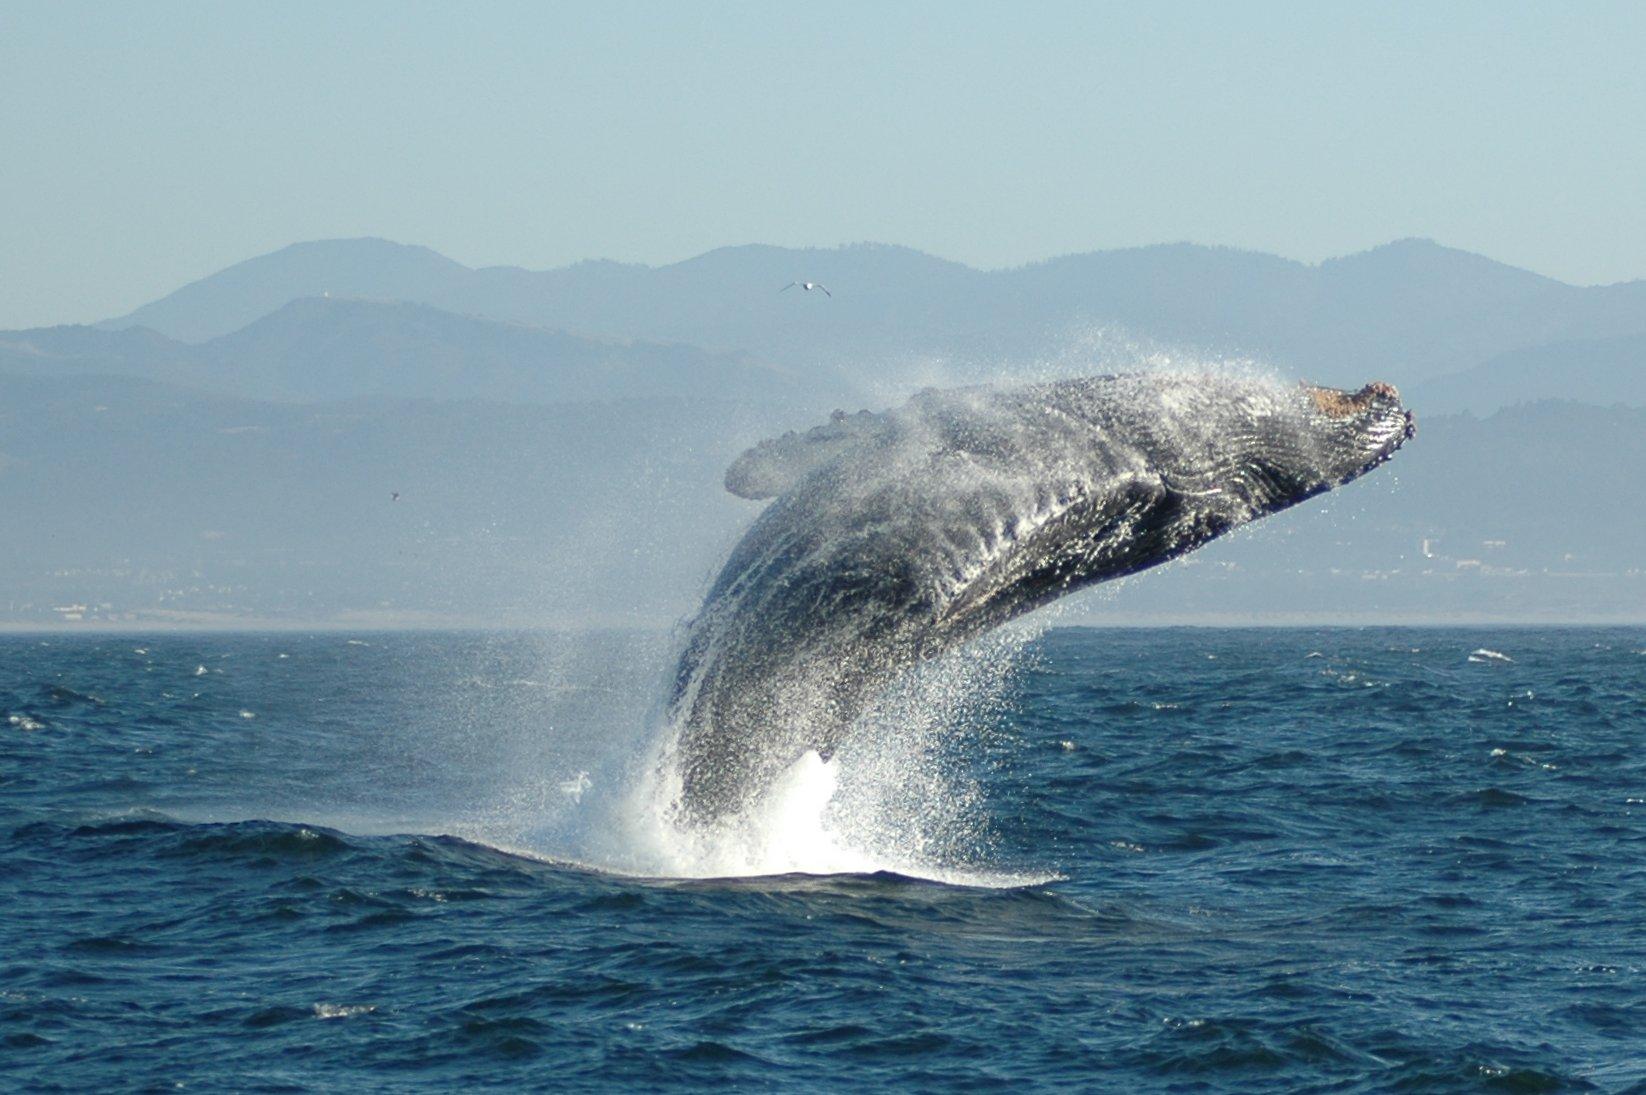 FileJumping Humpback whalejpg   Wikipedia the encyclopedia 1646x1095